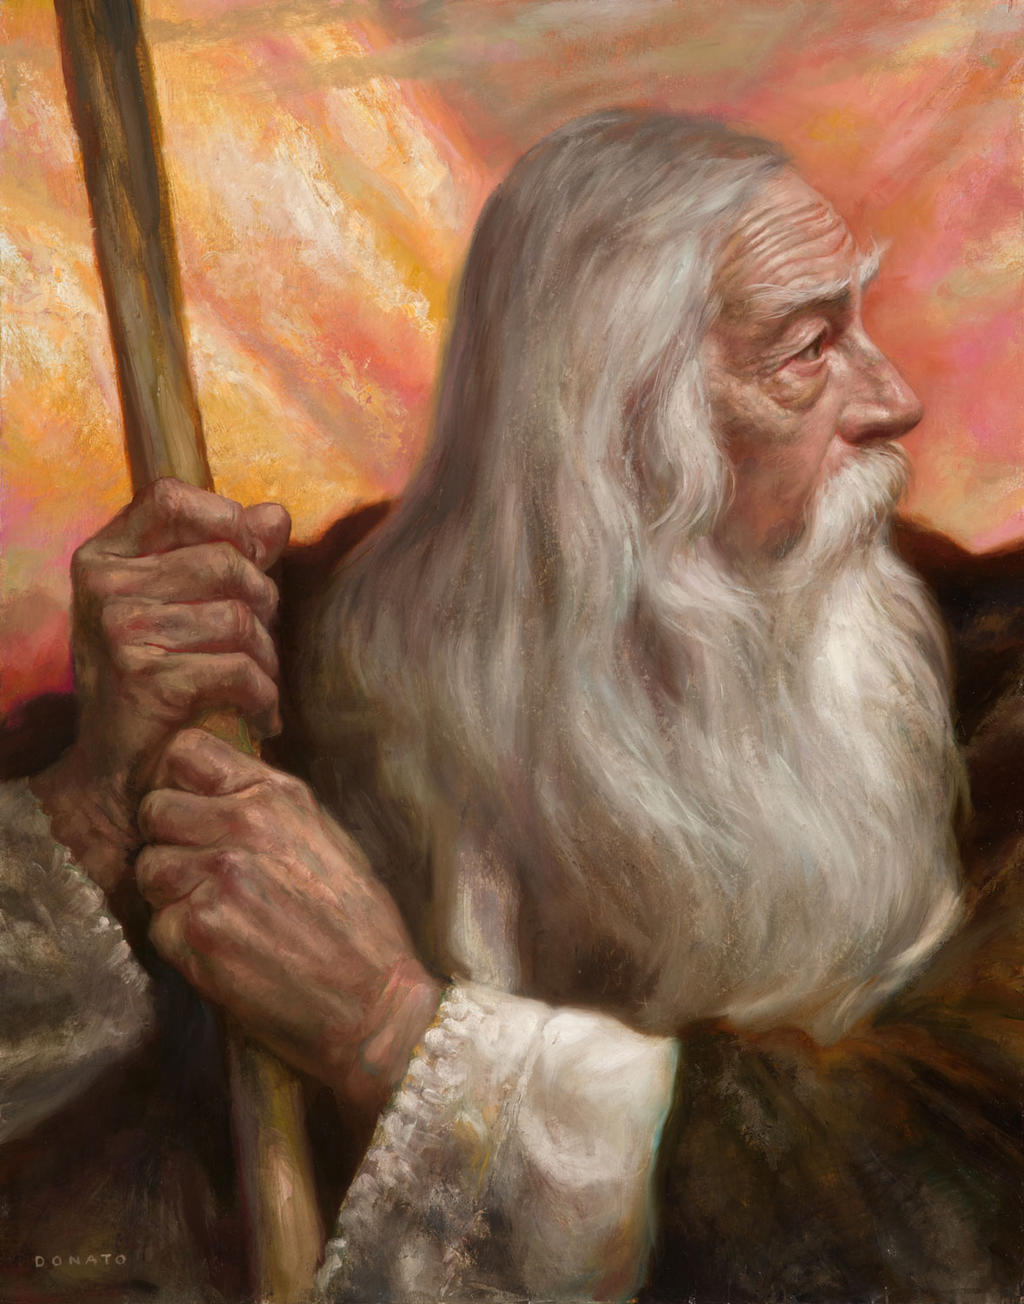 Gandalf-Caradhras by DonatoArts